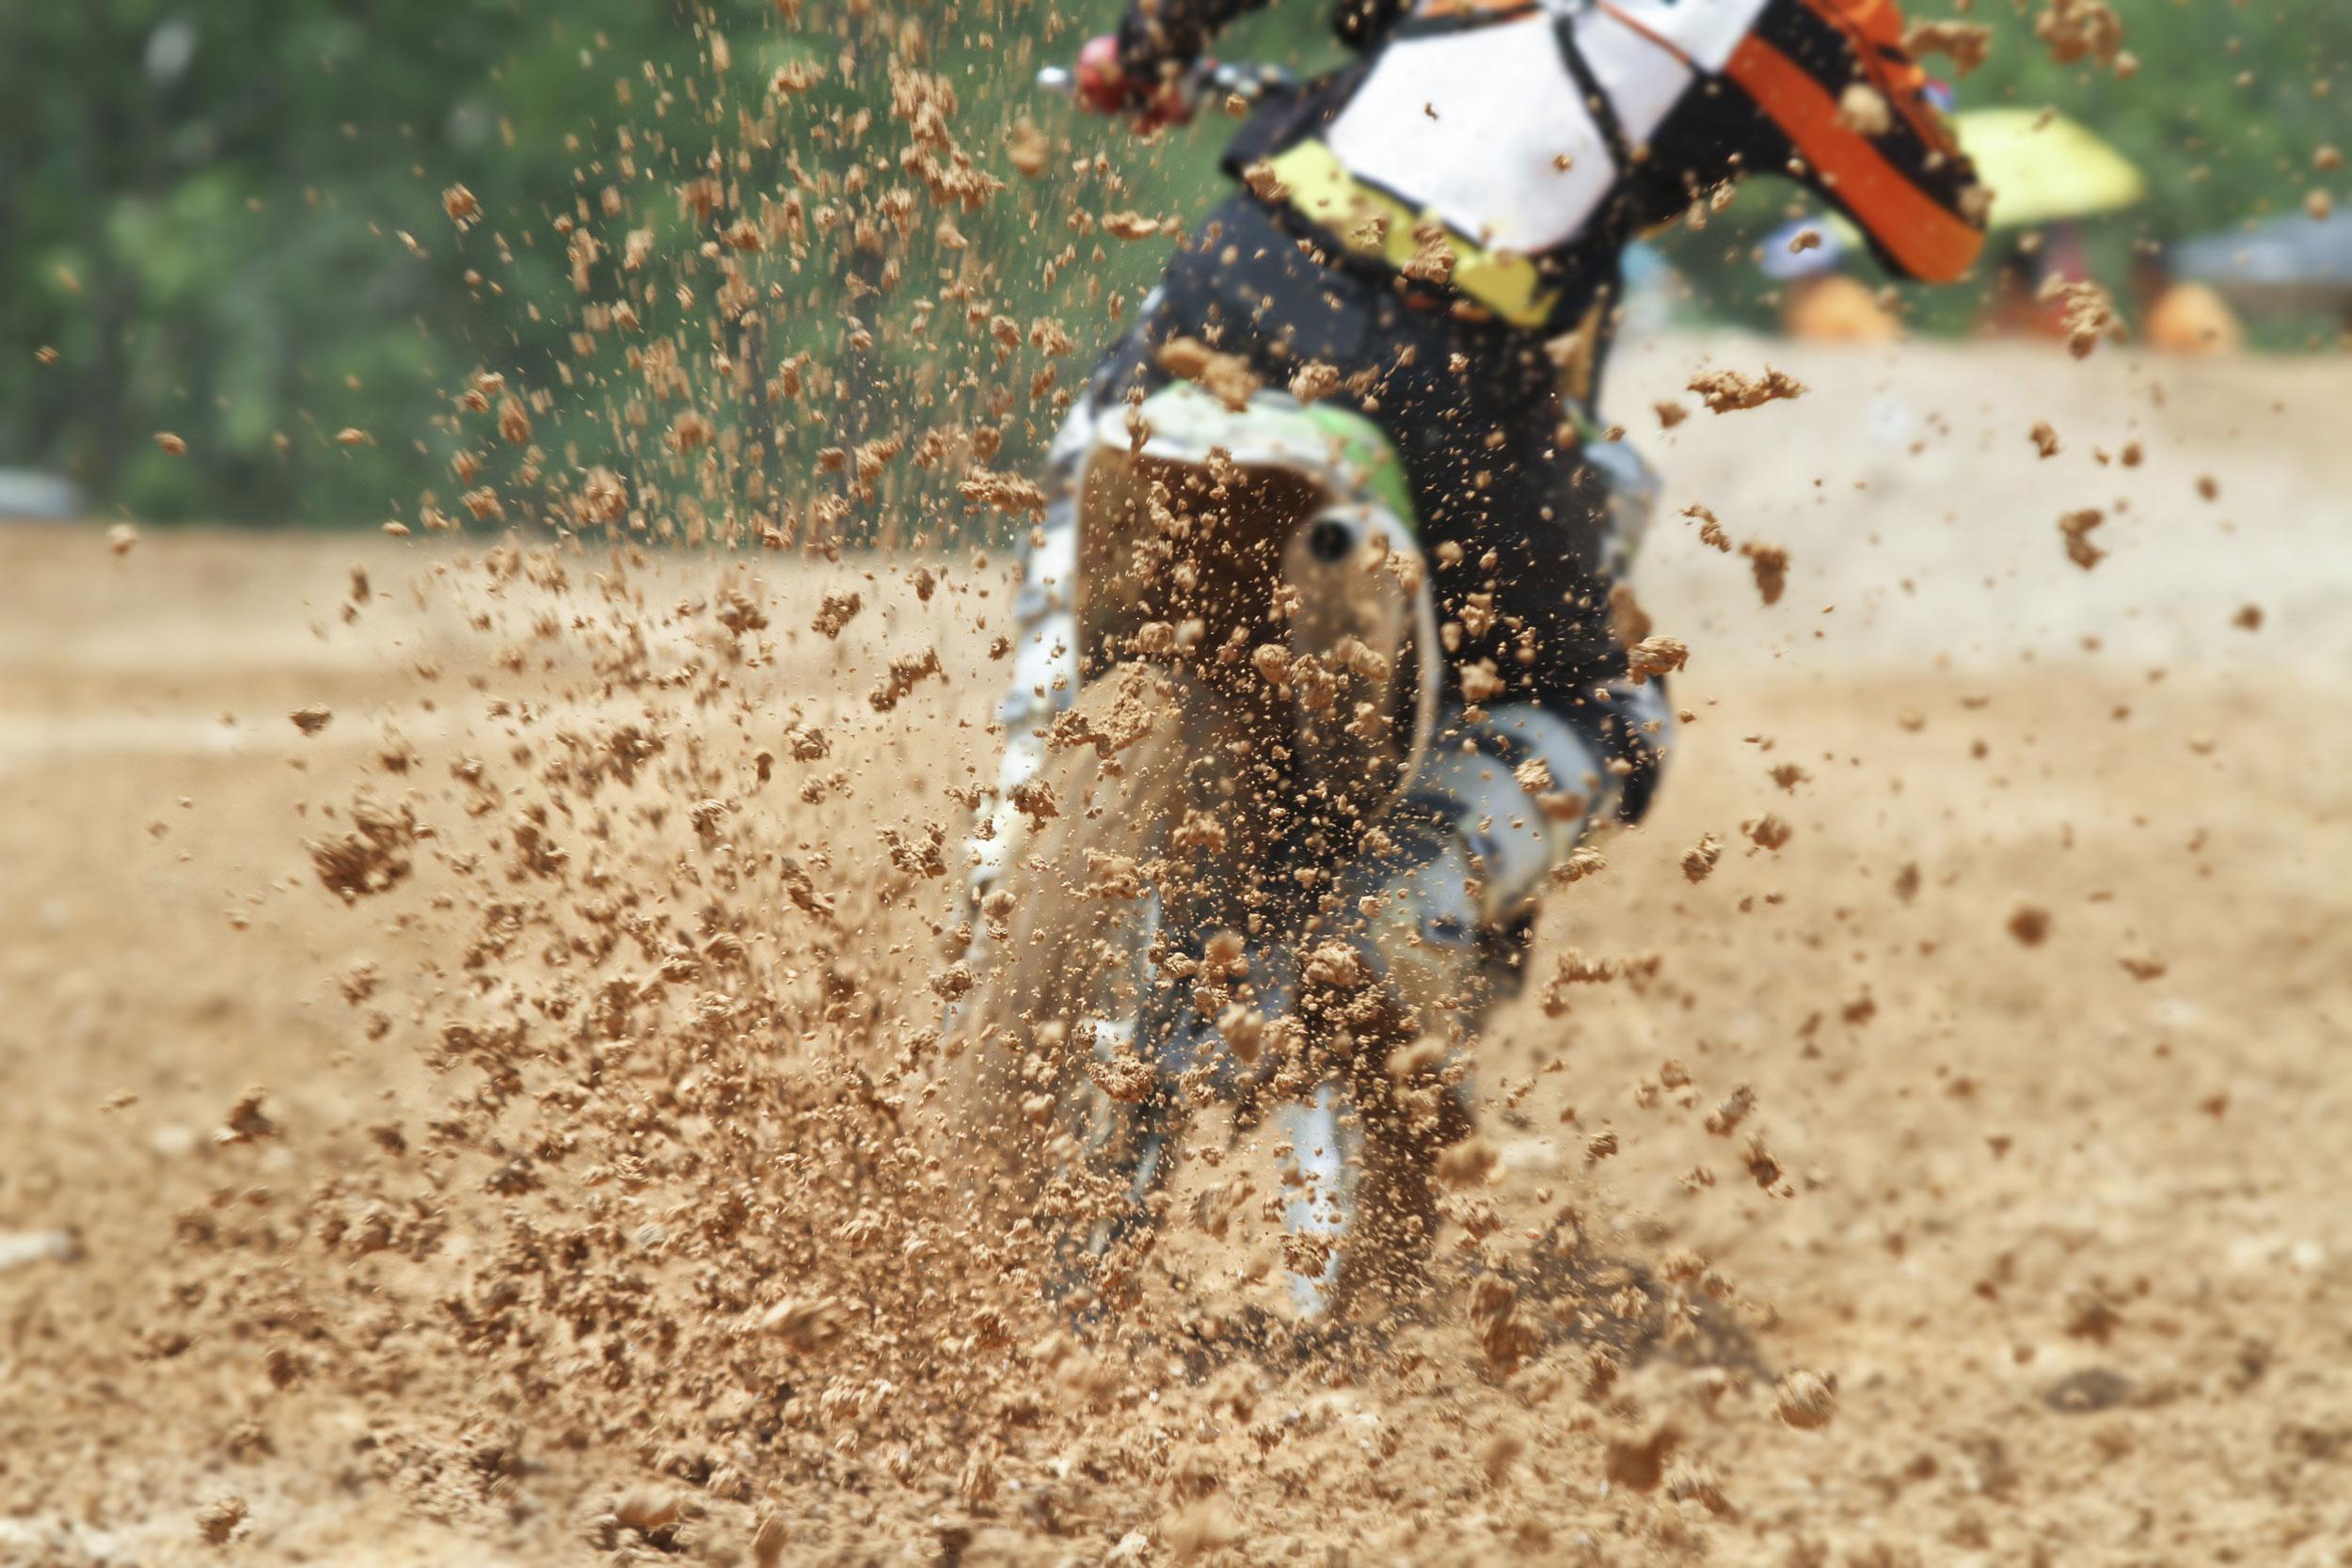 saskatchewan_motocross_4